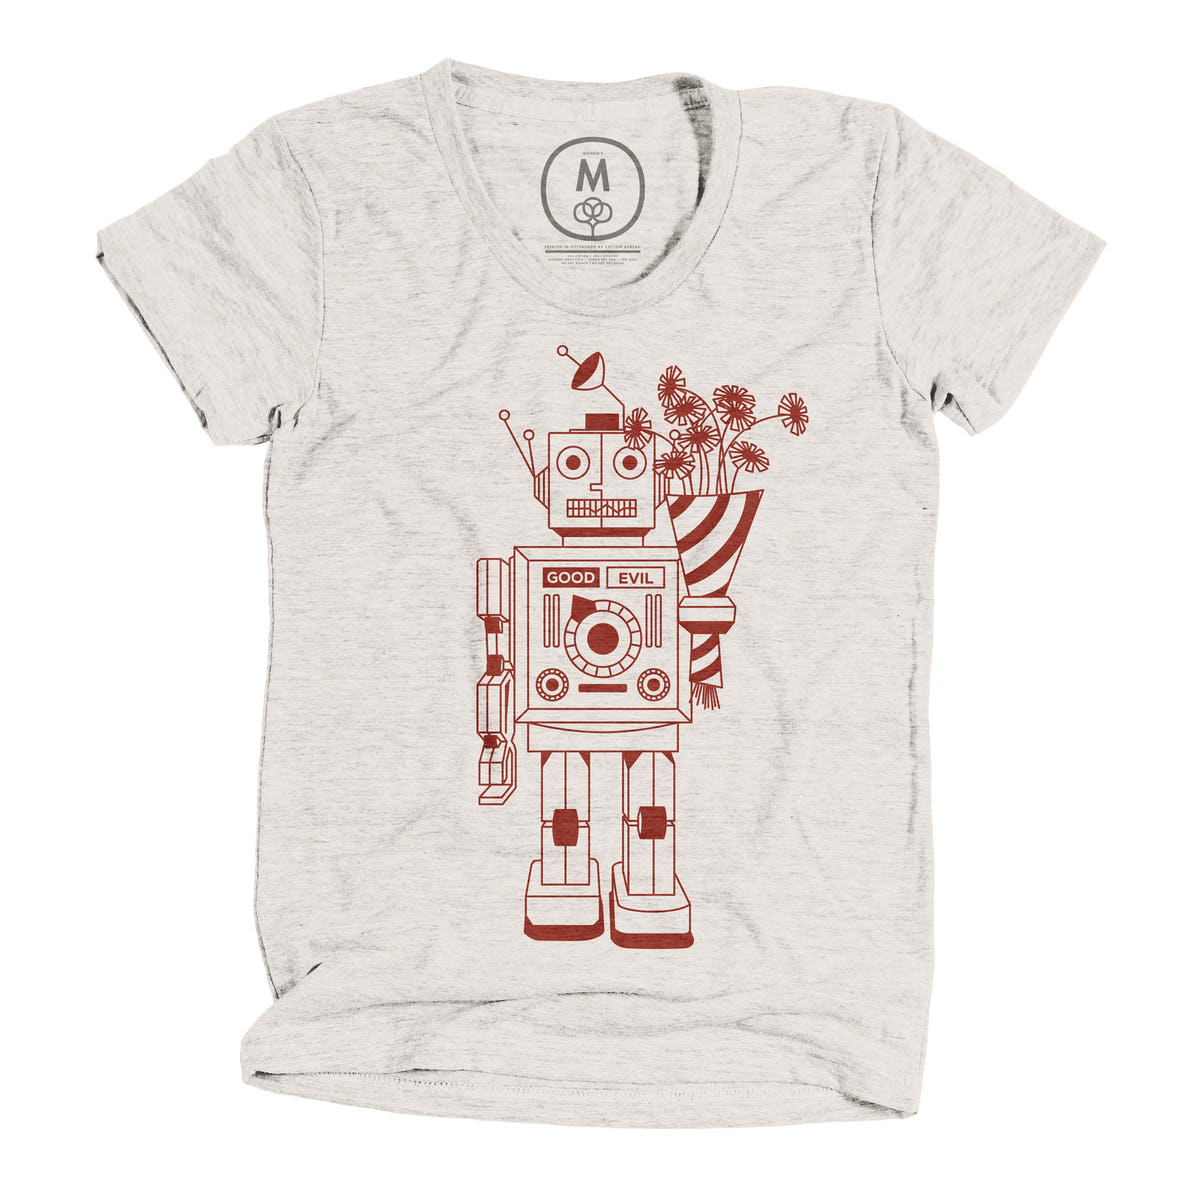 good robot graphic tee by james viola cotton bureau good robot graphic tee by james viola cotton bureau